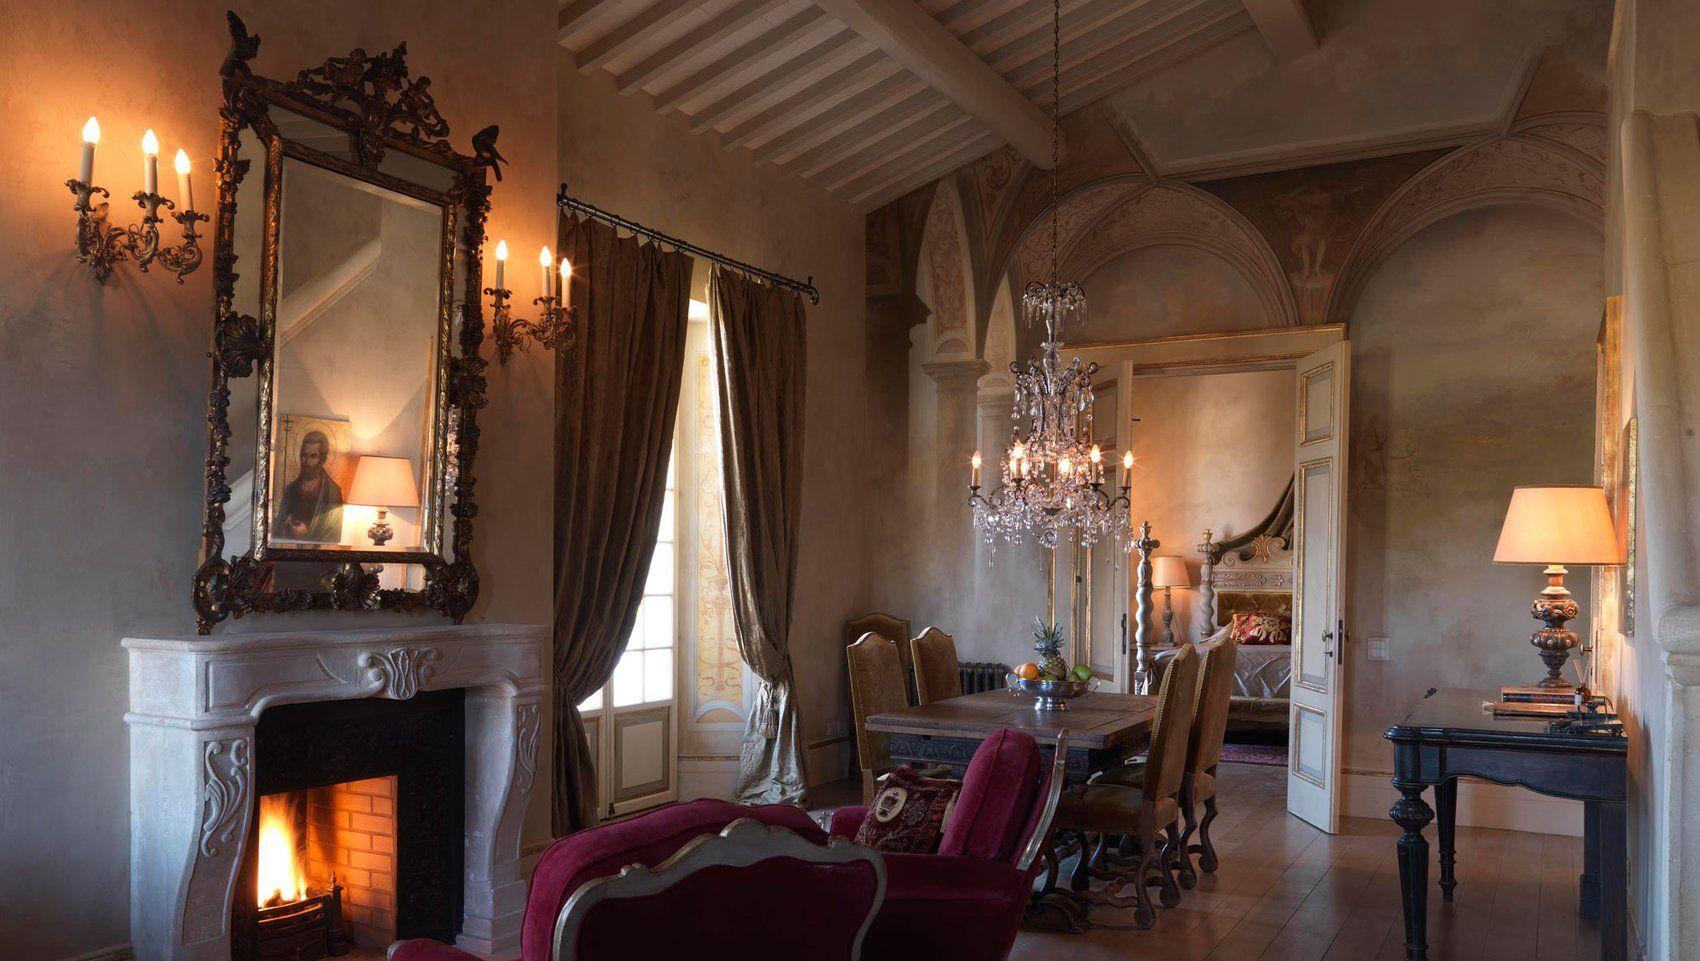 Toskanisches Luxushotel | Antique Interiors | Pinterest